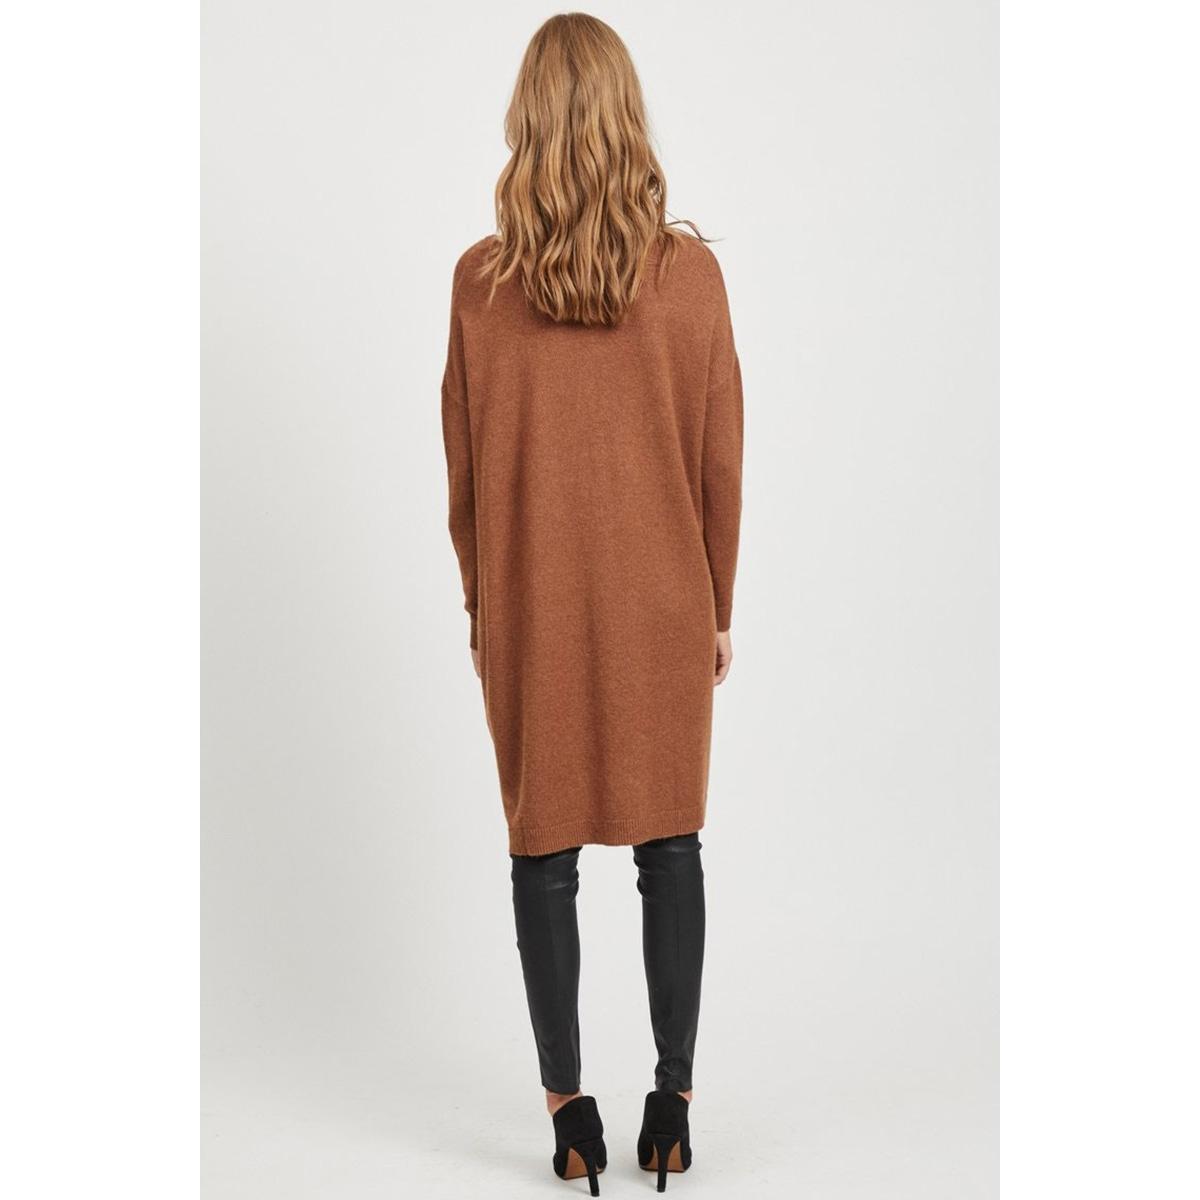 viril l/s knit tunic-fav nx 14055882 vila tuniek caramel cafe/melange